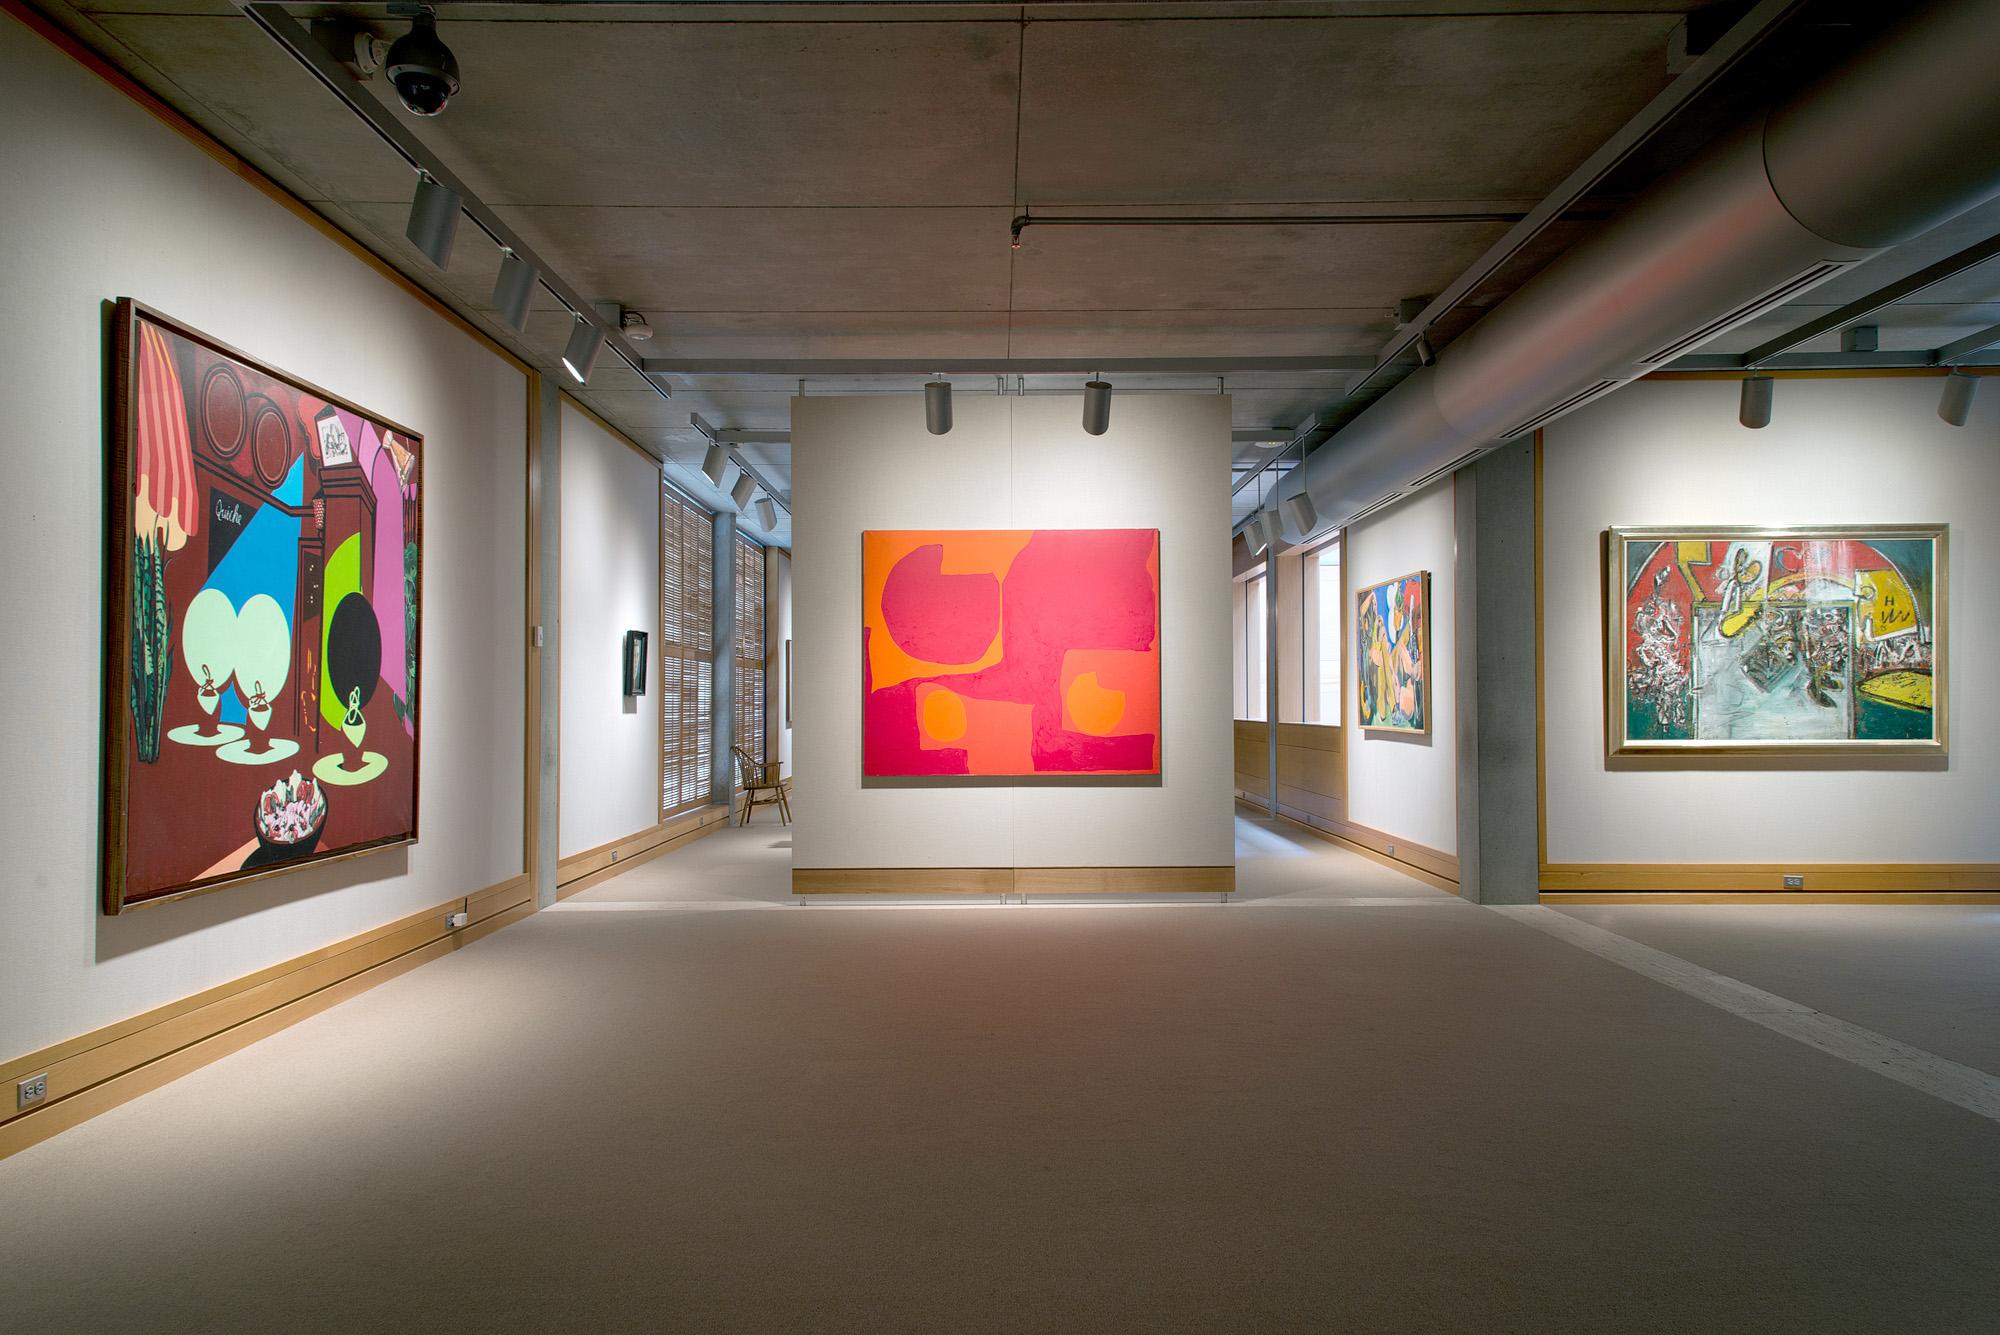 Britain in the World installation, second-floor galleries, Yale Center for British Art, photo by Richard Caspole